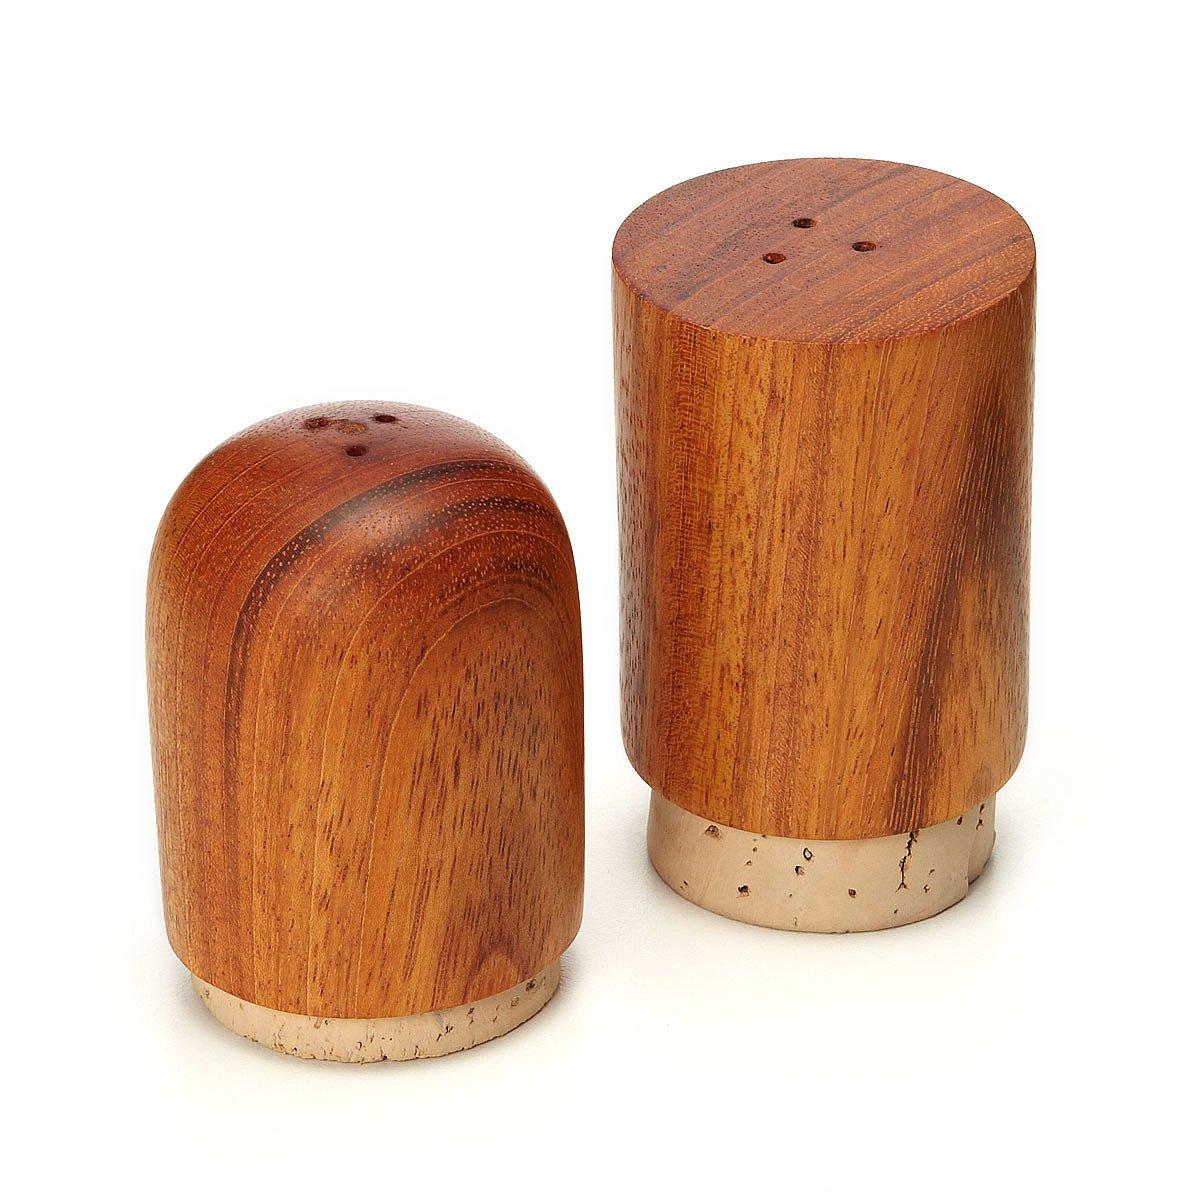 wooden salt and pepper shaker set  wood seasoning shakers  - wooden salt and pepper shaker set  thumbnail